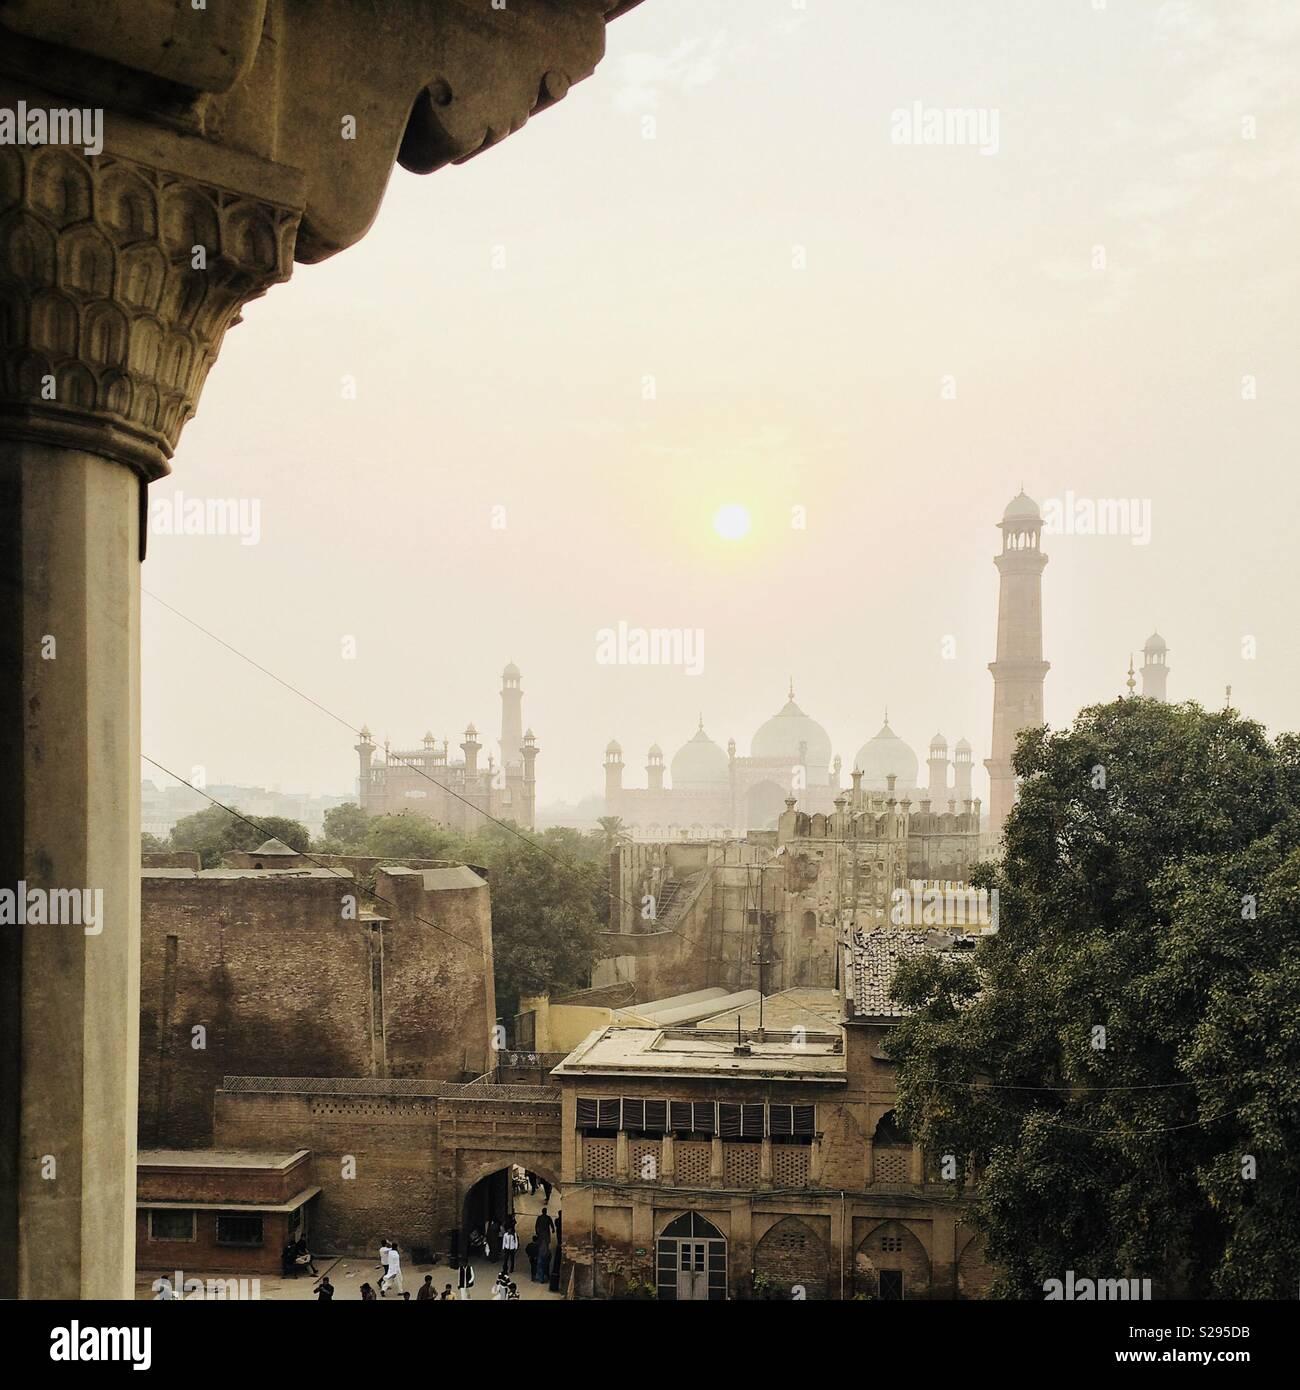 Lahore, Pakistan - Stock Image